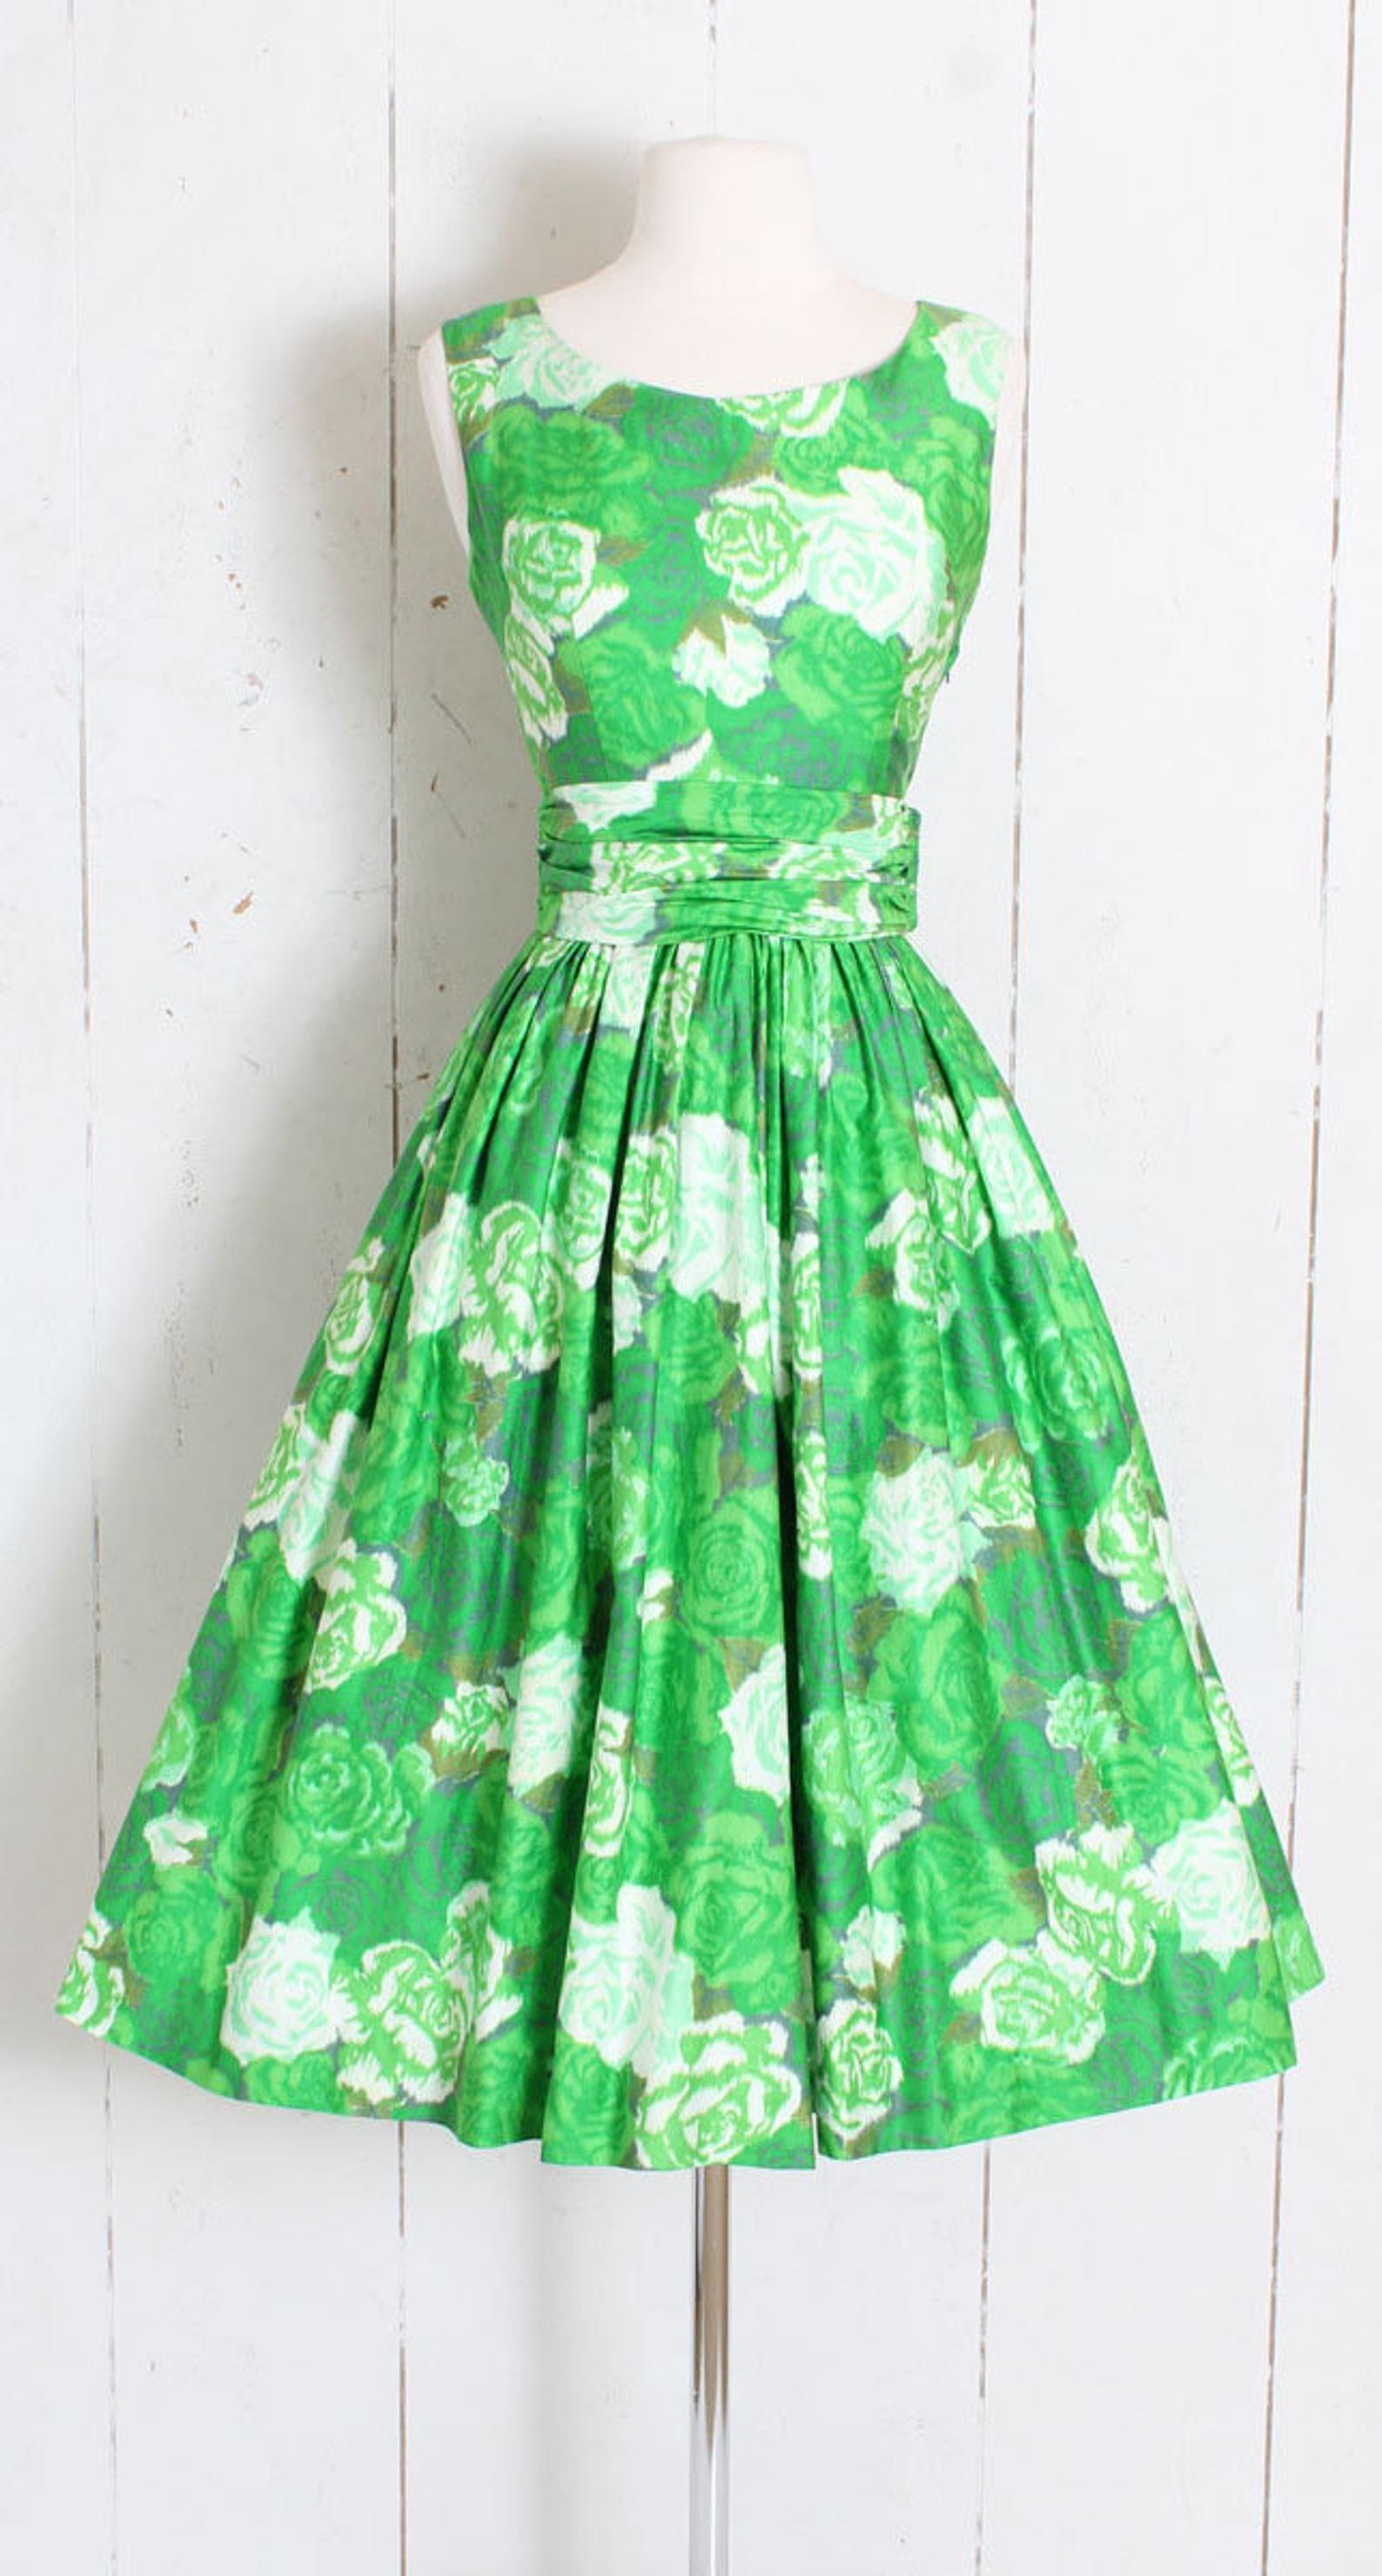 Vintage 1950s 50s Dress Green Cotton Rose Print Xs S Small Etsy 50s Dresses Vintage Dresses 50s Vintage Dresses Online [ 2959 x 1588 Pixel ]